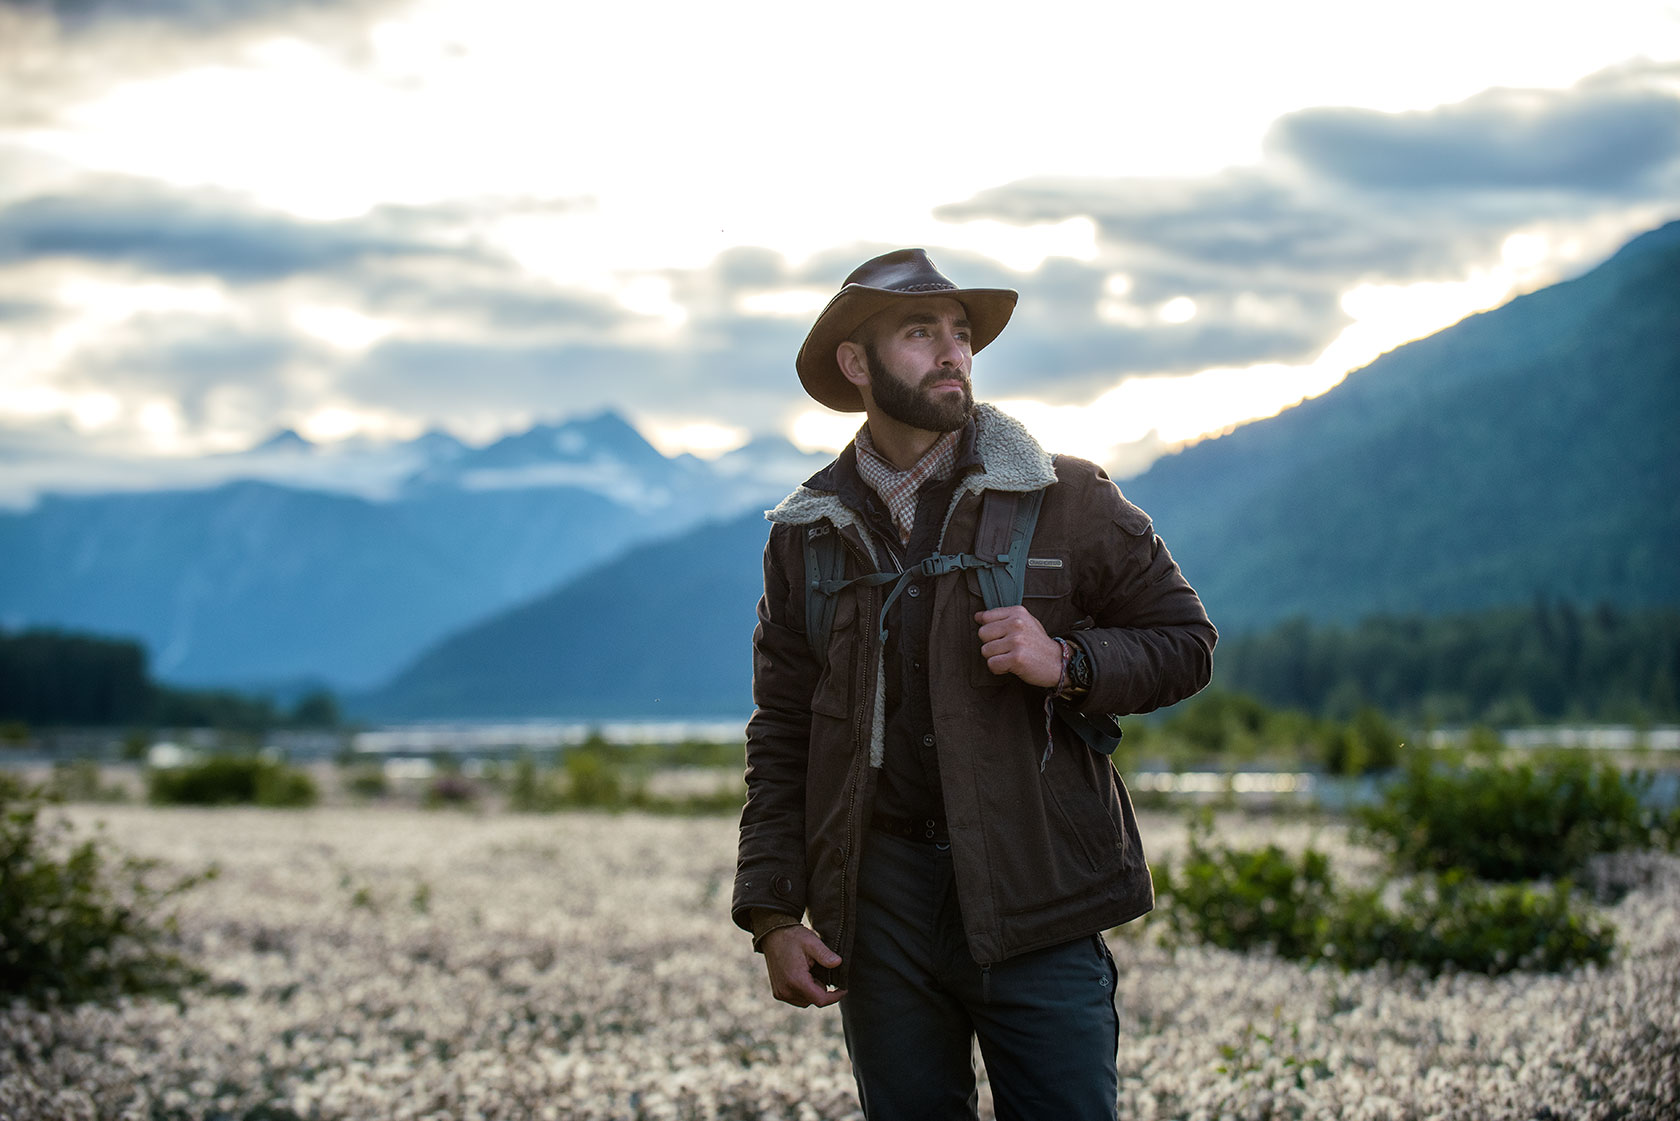 austin-trigg-brave-wilderness-alaska-BW-Coyote-Stands-in-Valley.jpg